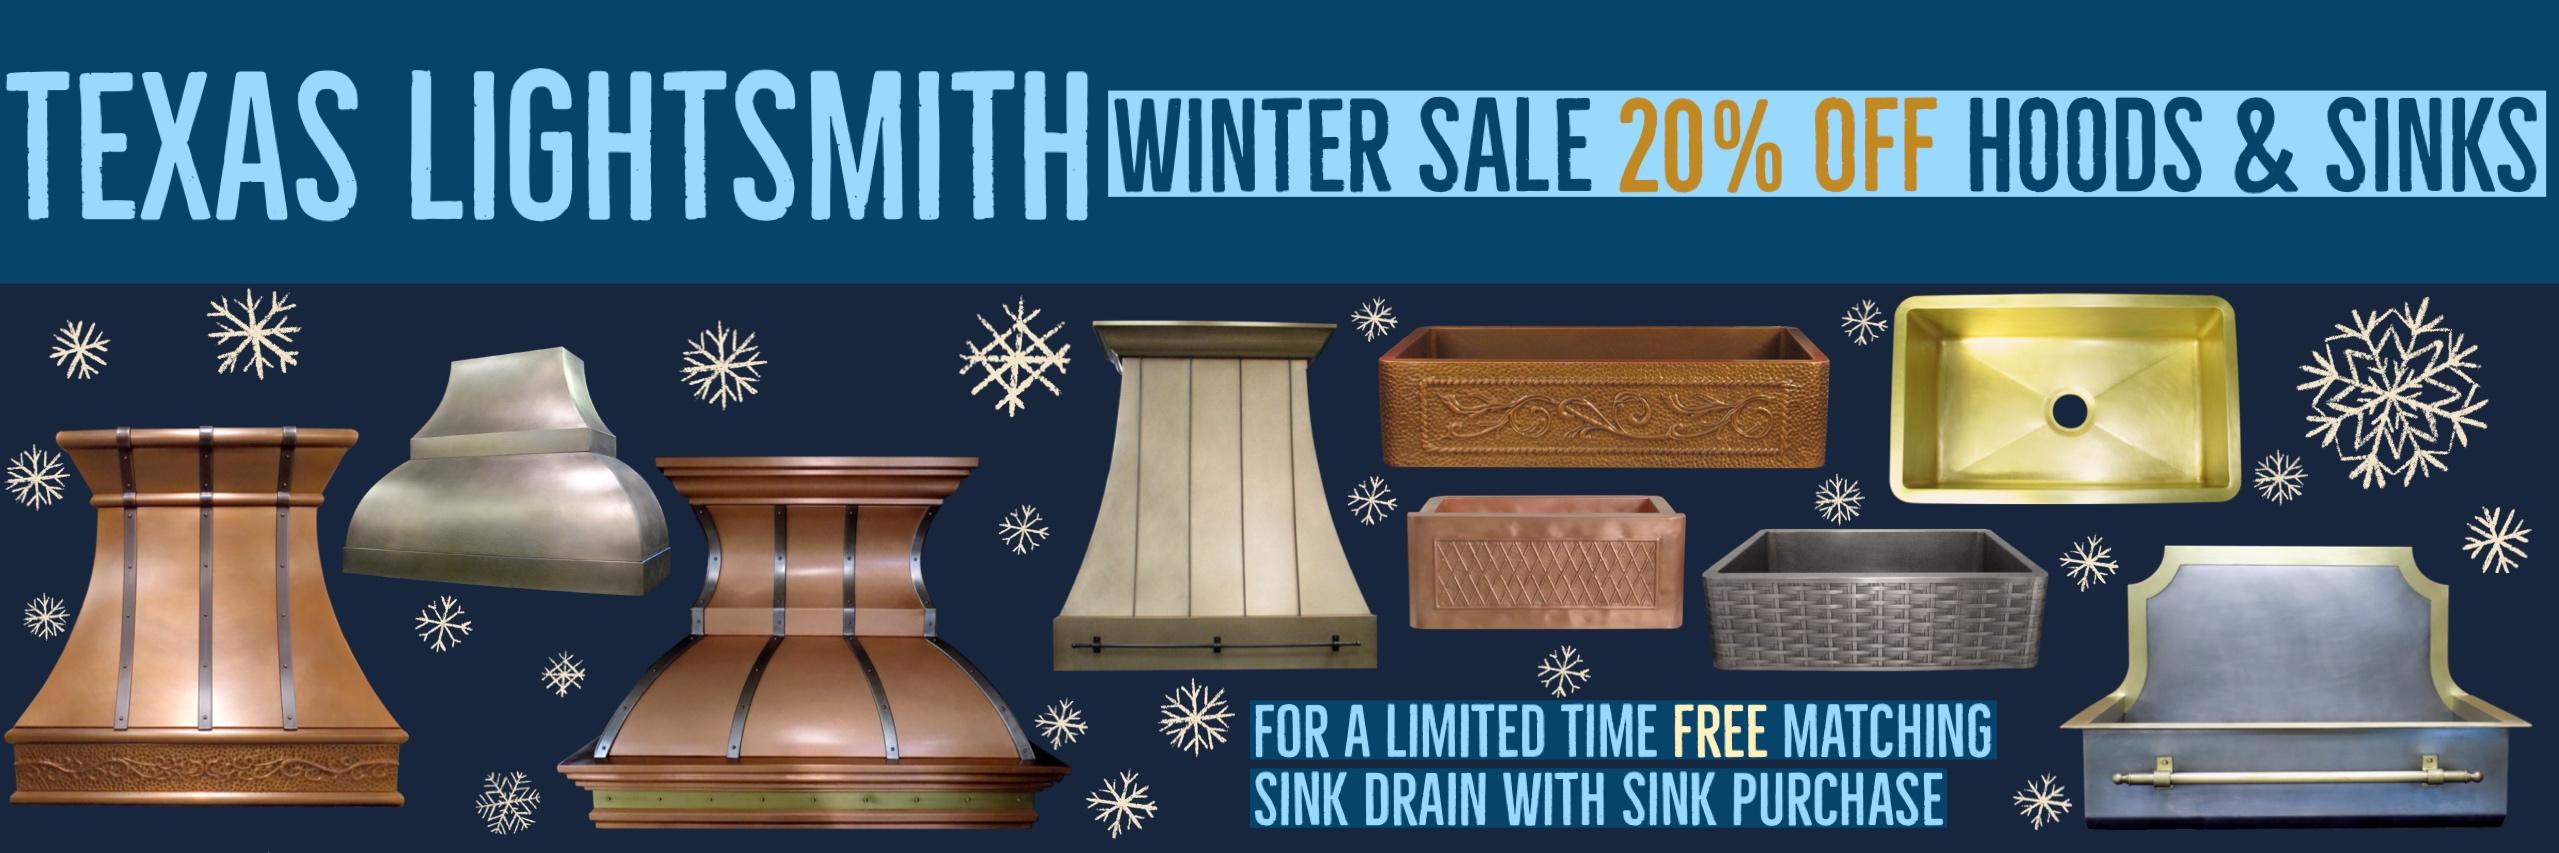 Winter Sale! 20% Off Hoods & Sinks